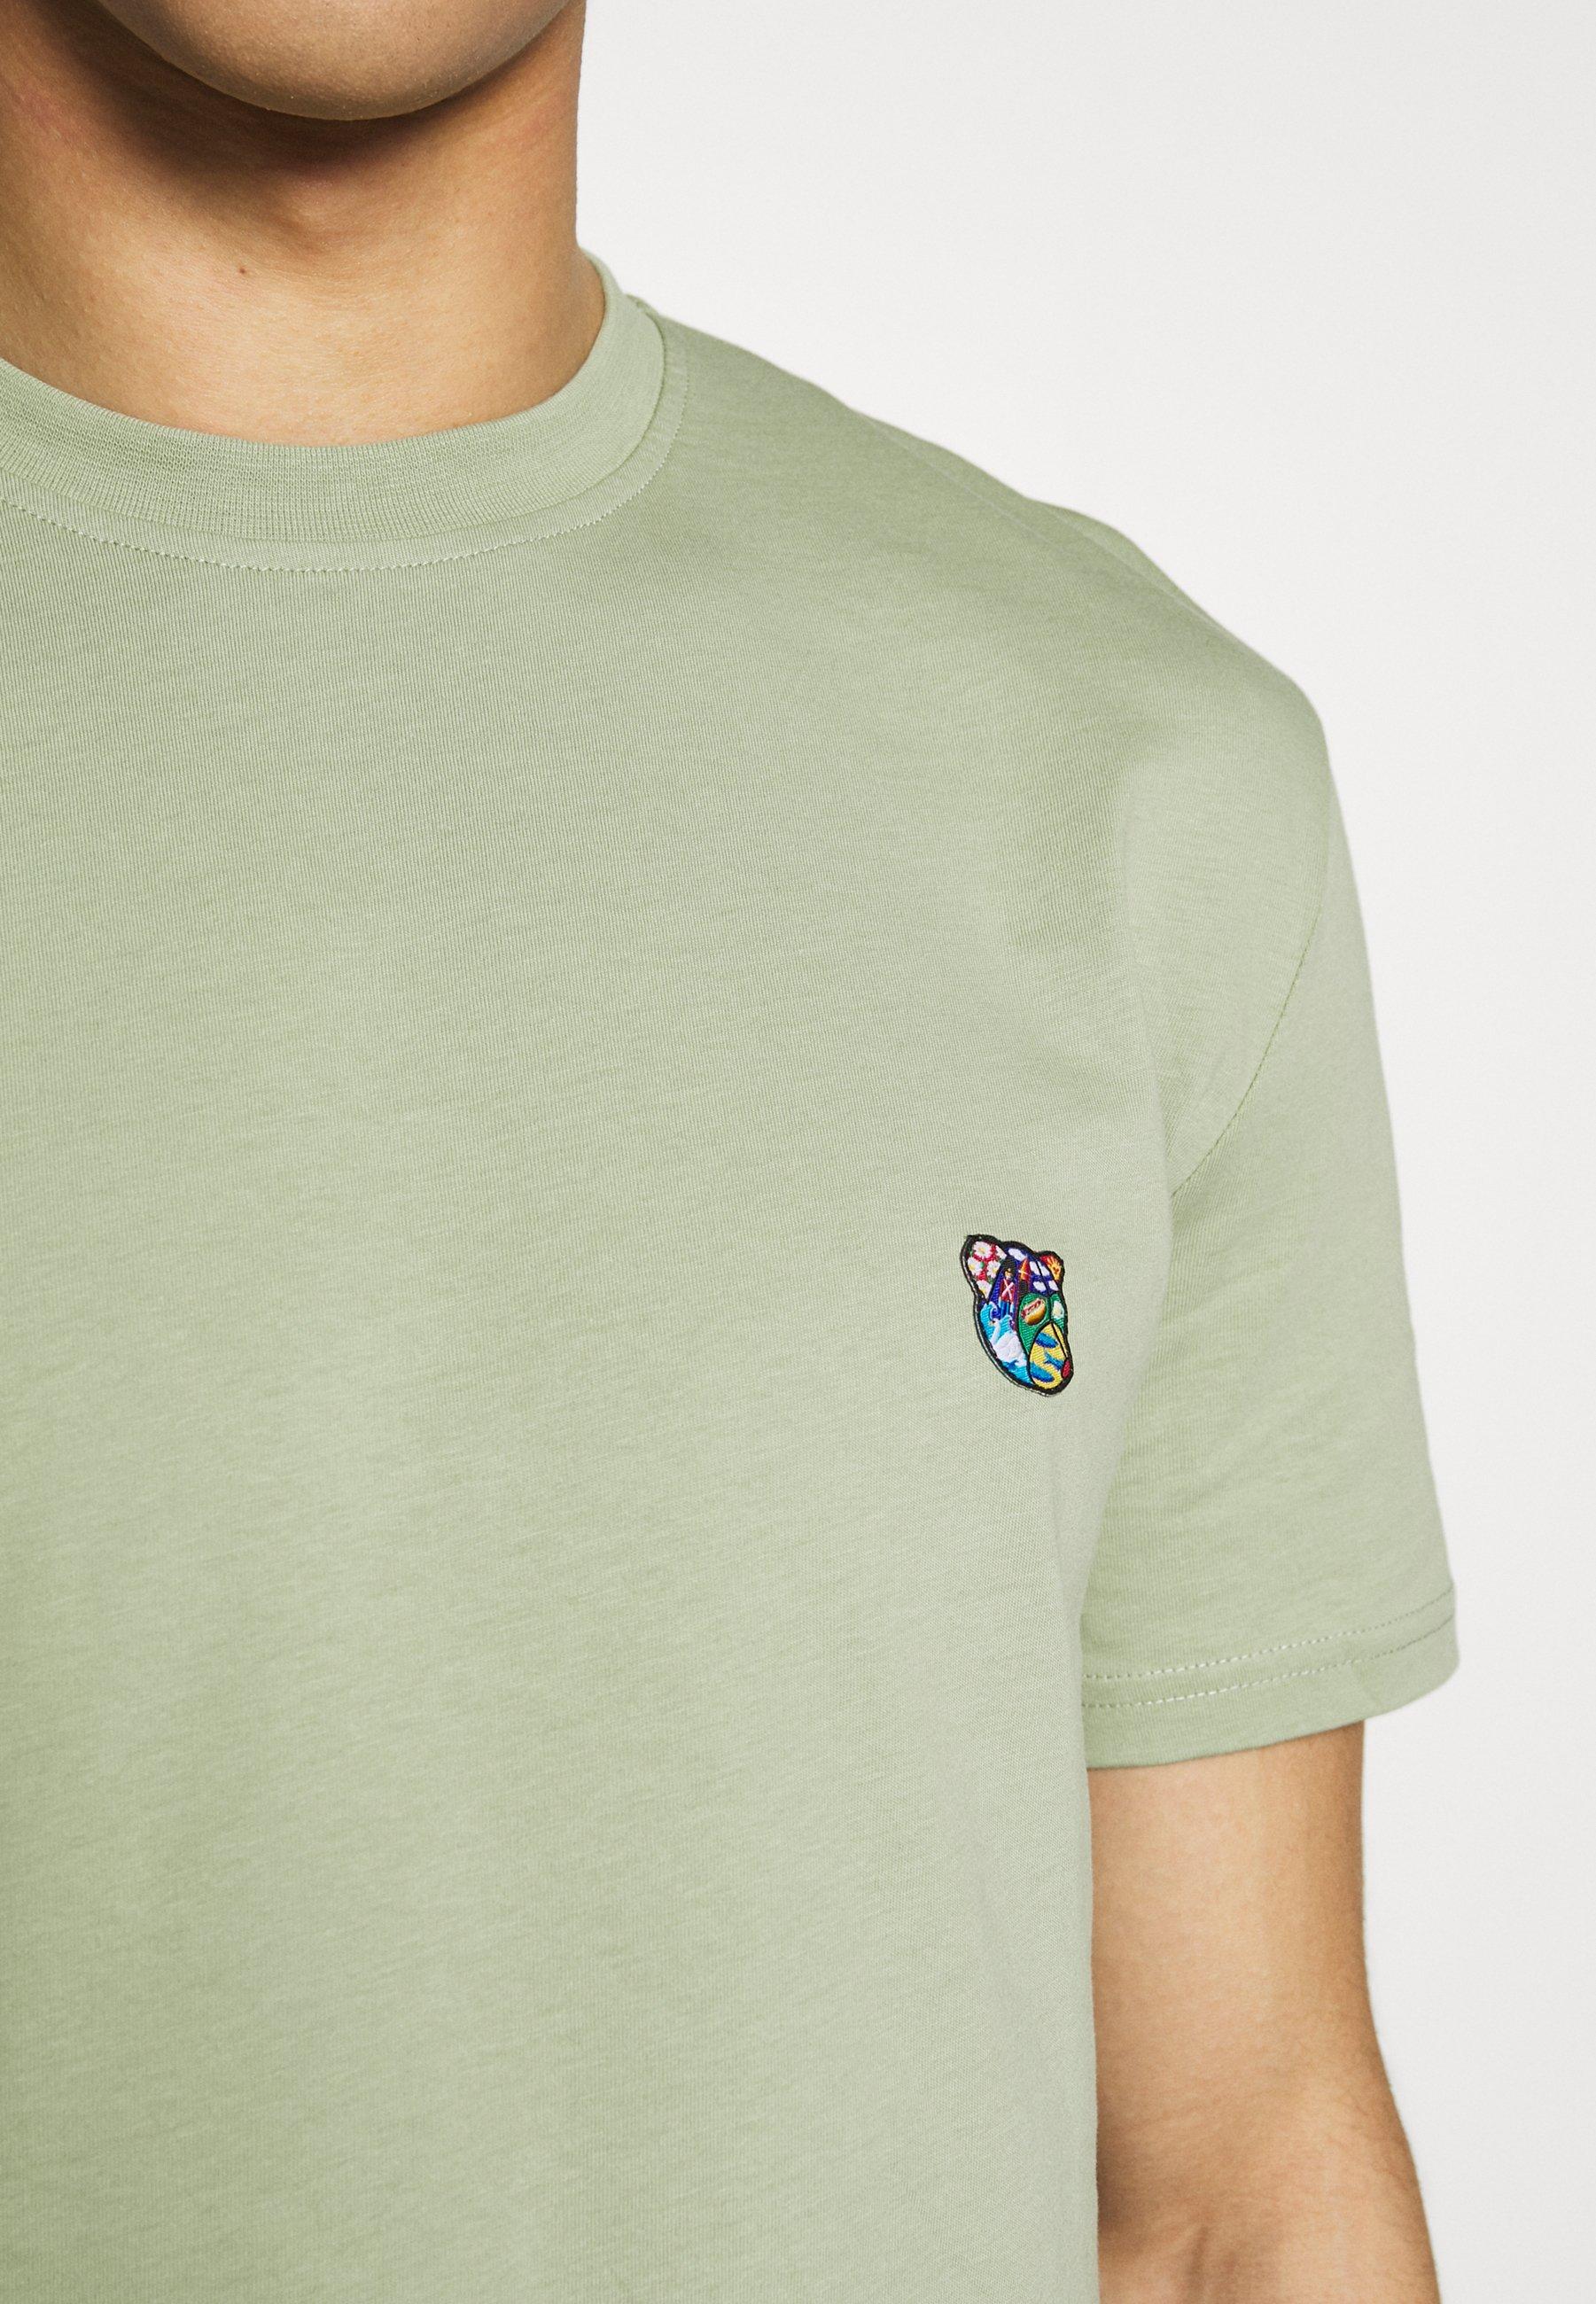 Tonsure Frank - T-shirt Basic Faded Green GlVUL